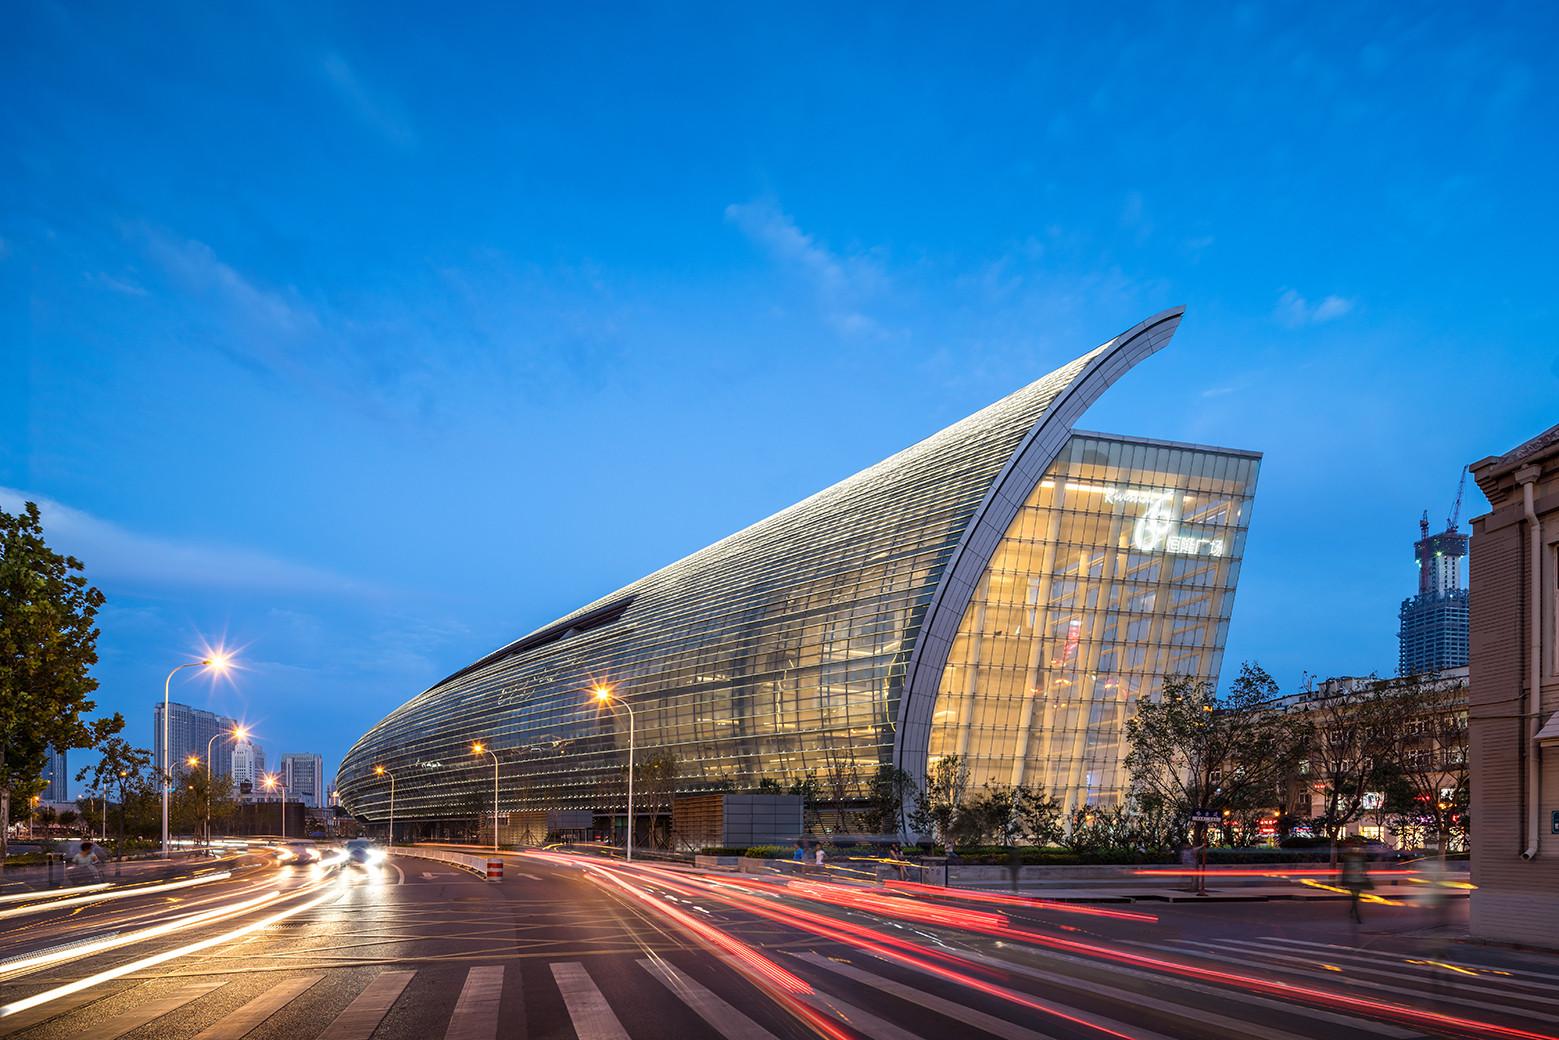 Tianjin Riverside 66 / Kohn Pedersen Fox, © Tim Griffith